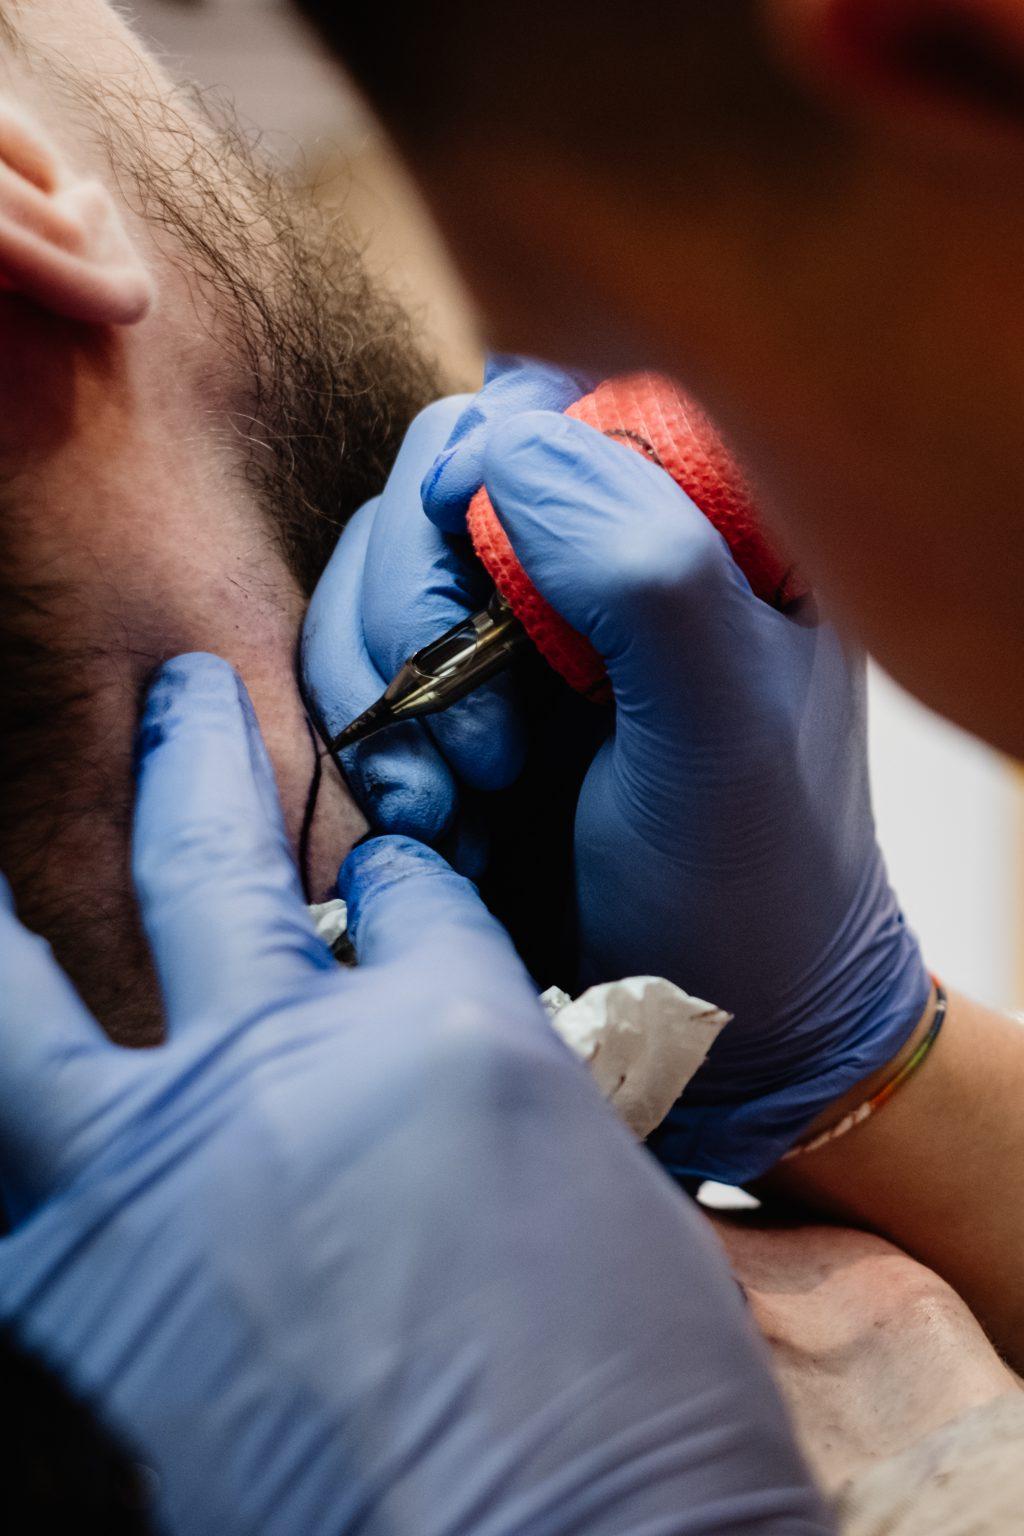 Tattoo artist at work closeup 3 - free stock photo